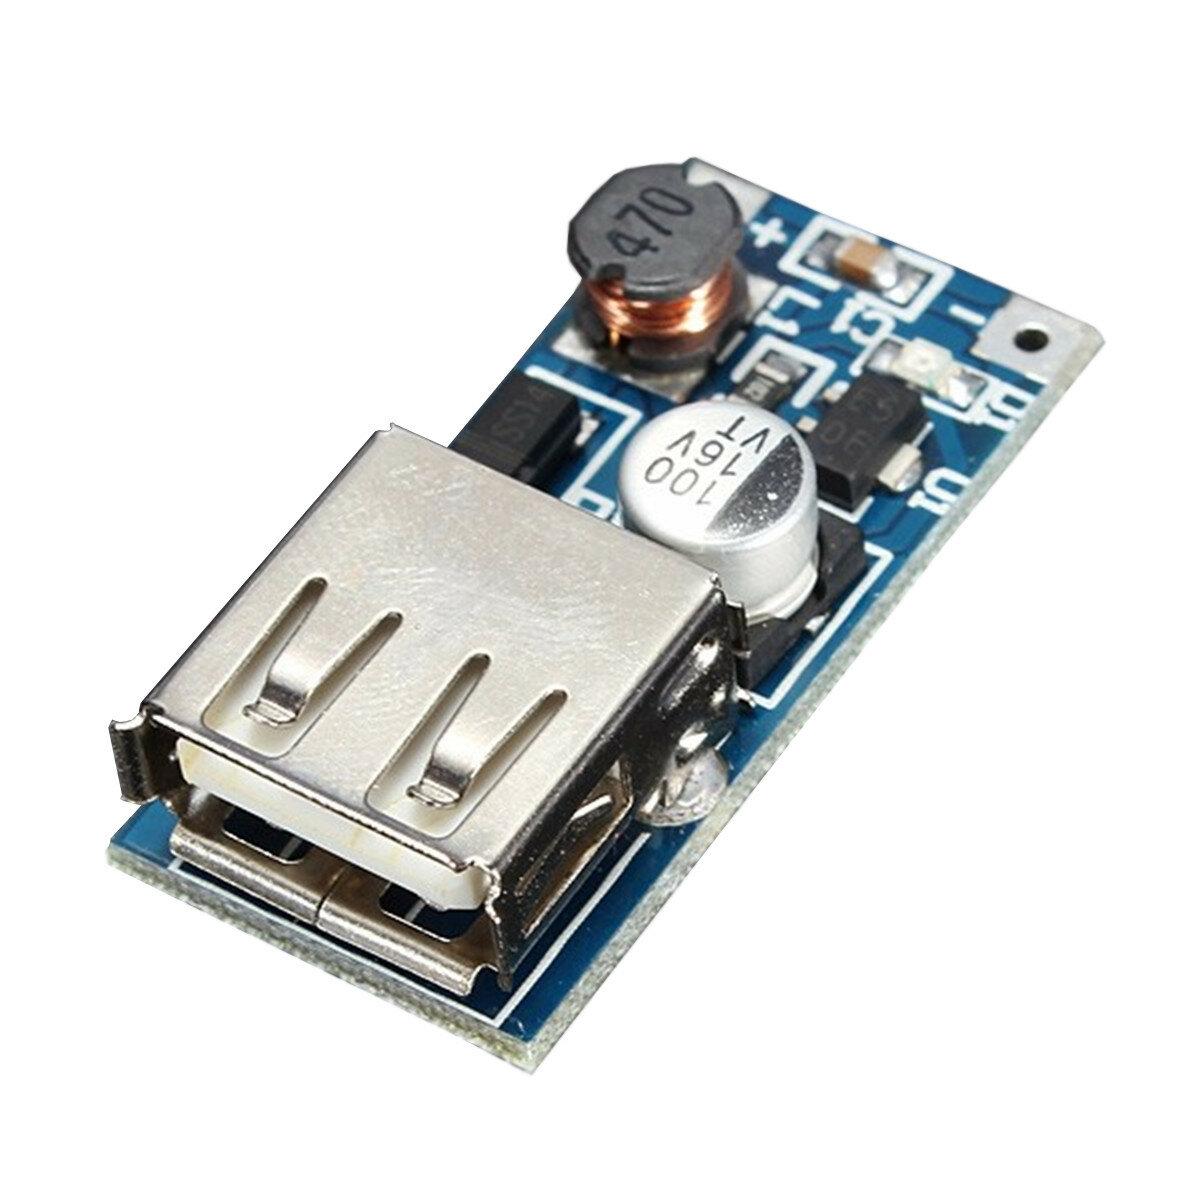 hight resolution of pfm control dc dc 0 9v 5v to usb 5v boost step up power supply module cod